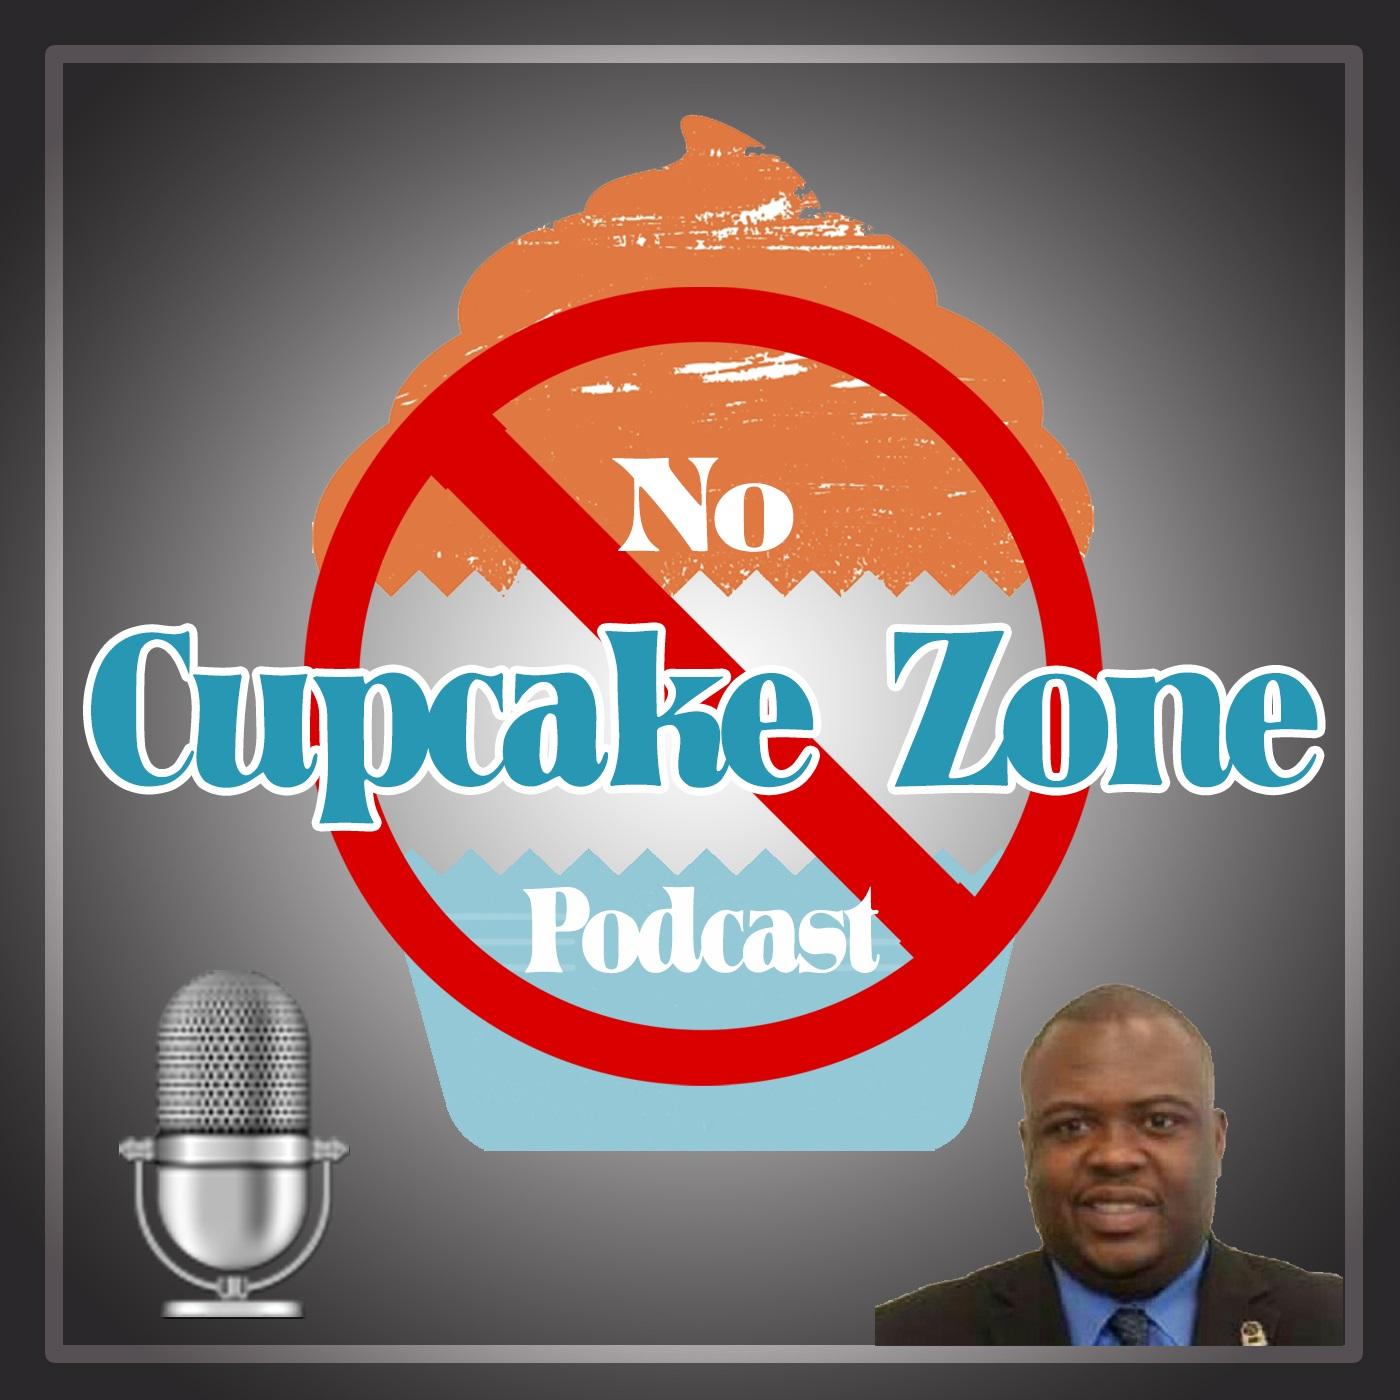 No Cupcake Zone Podcast